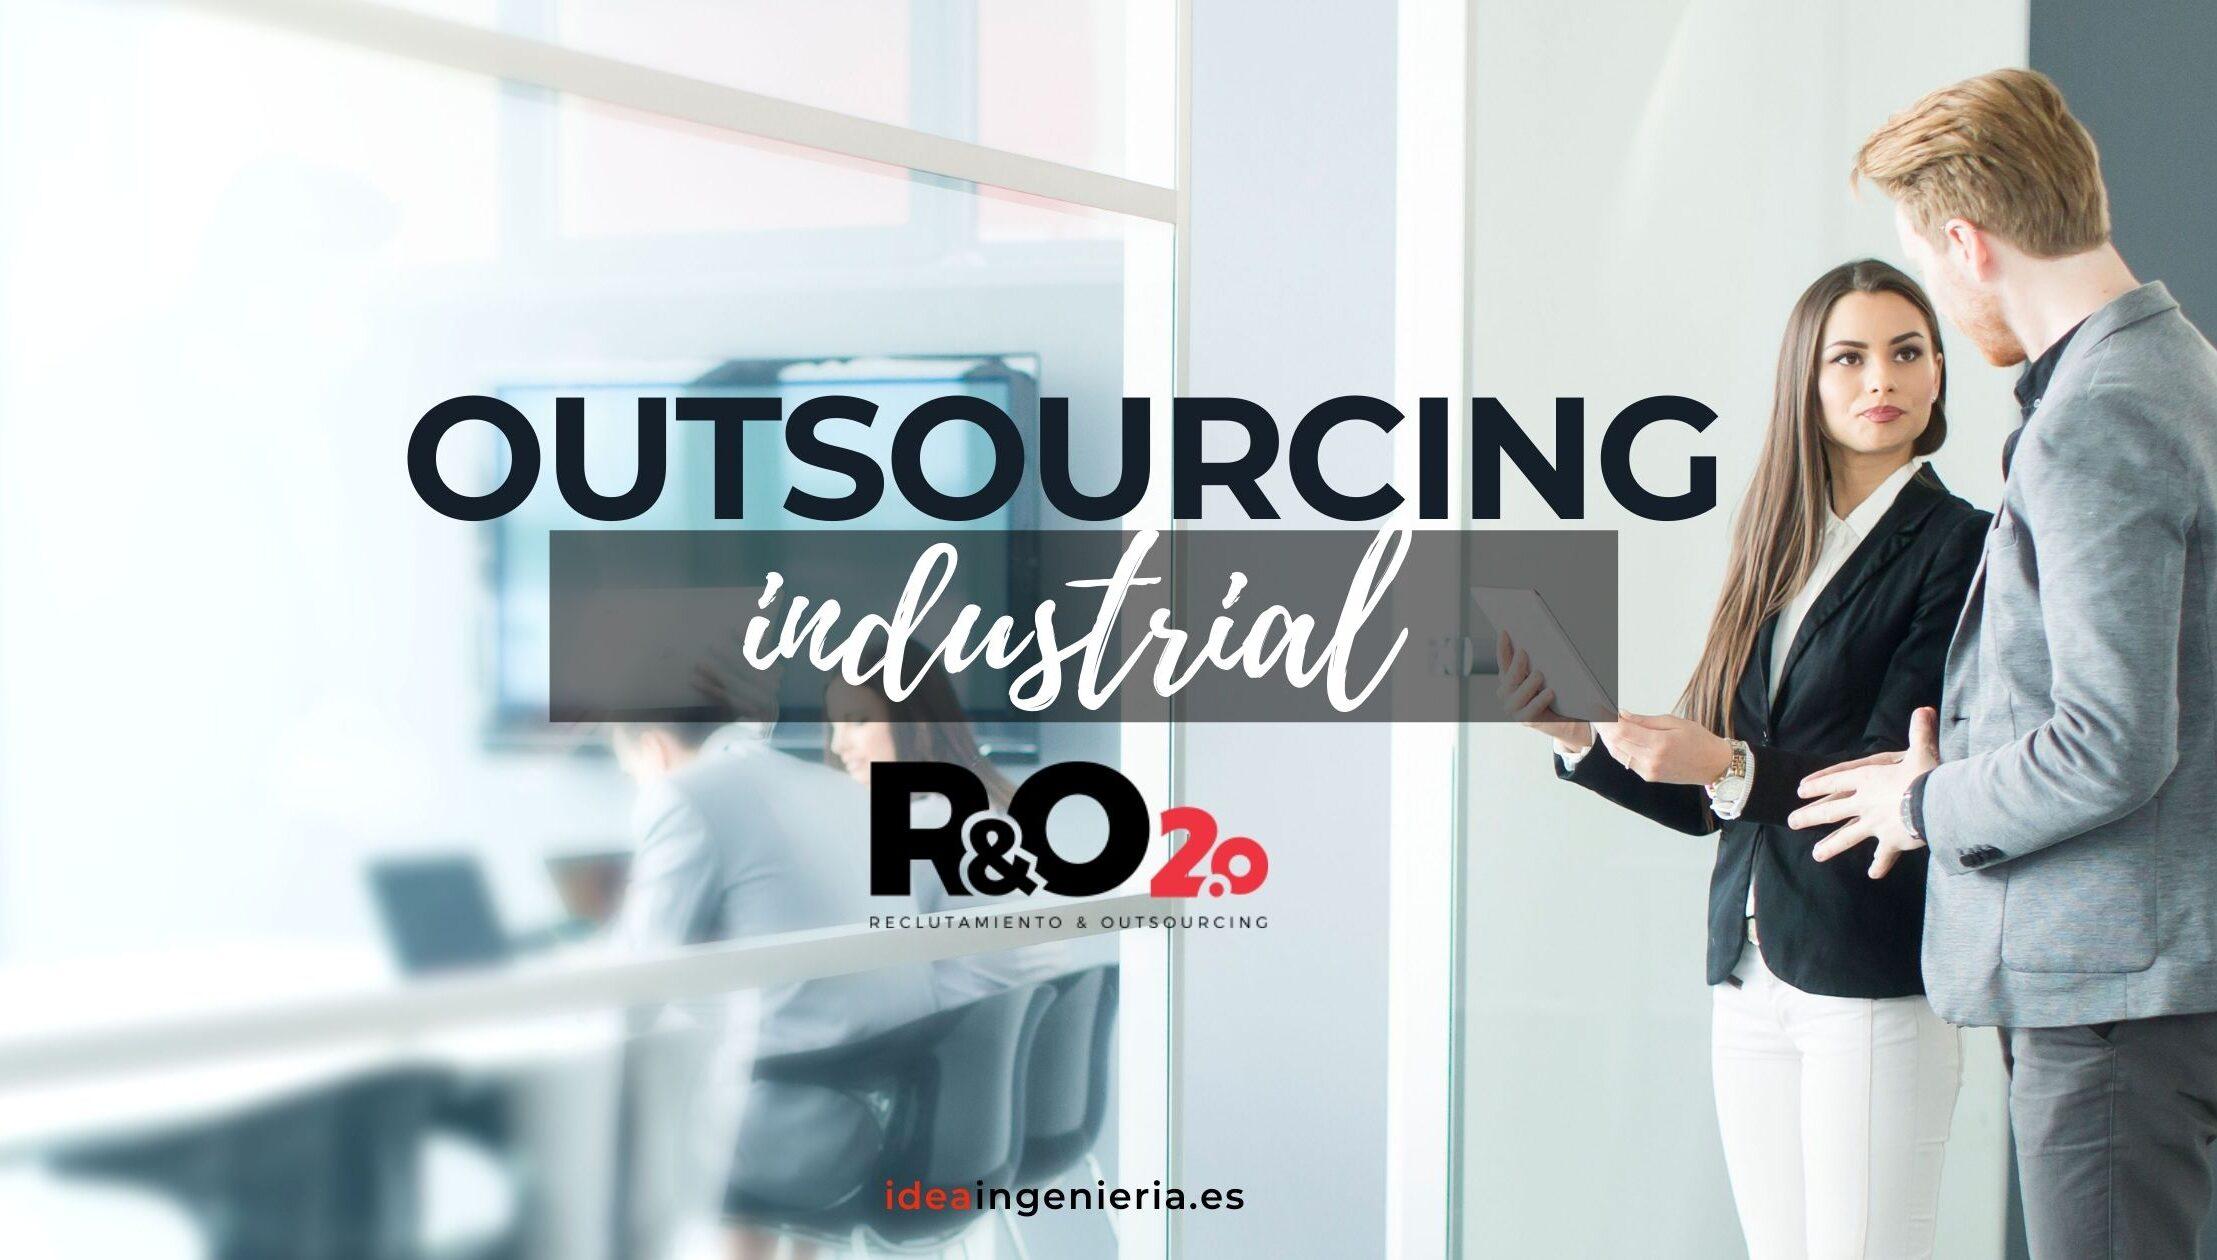 servicios de outsourcing industrial